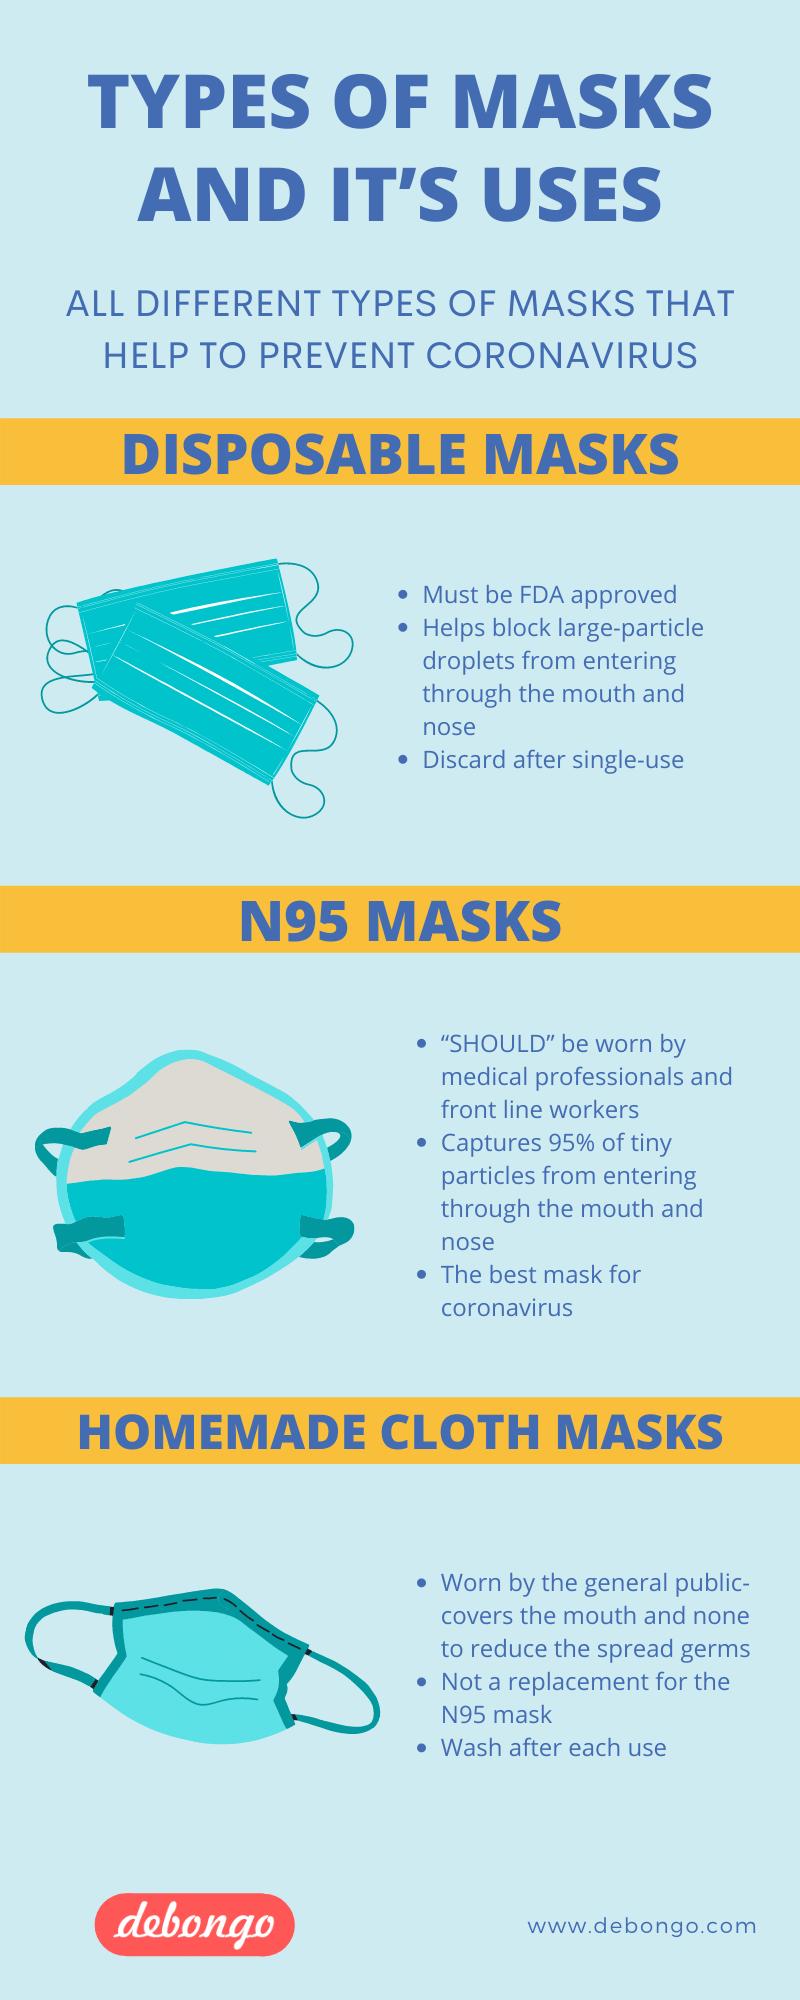 Types of Masks for Coronavirus - Debongo.com